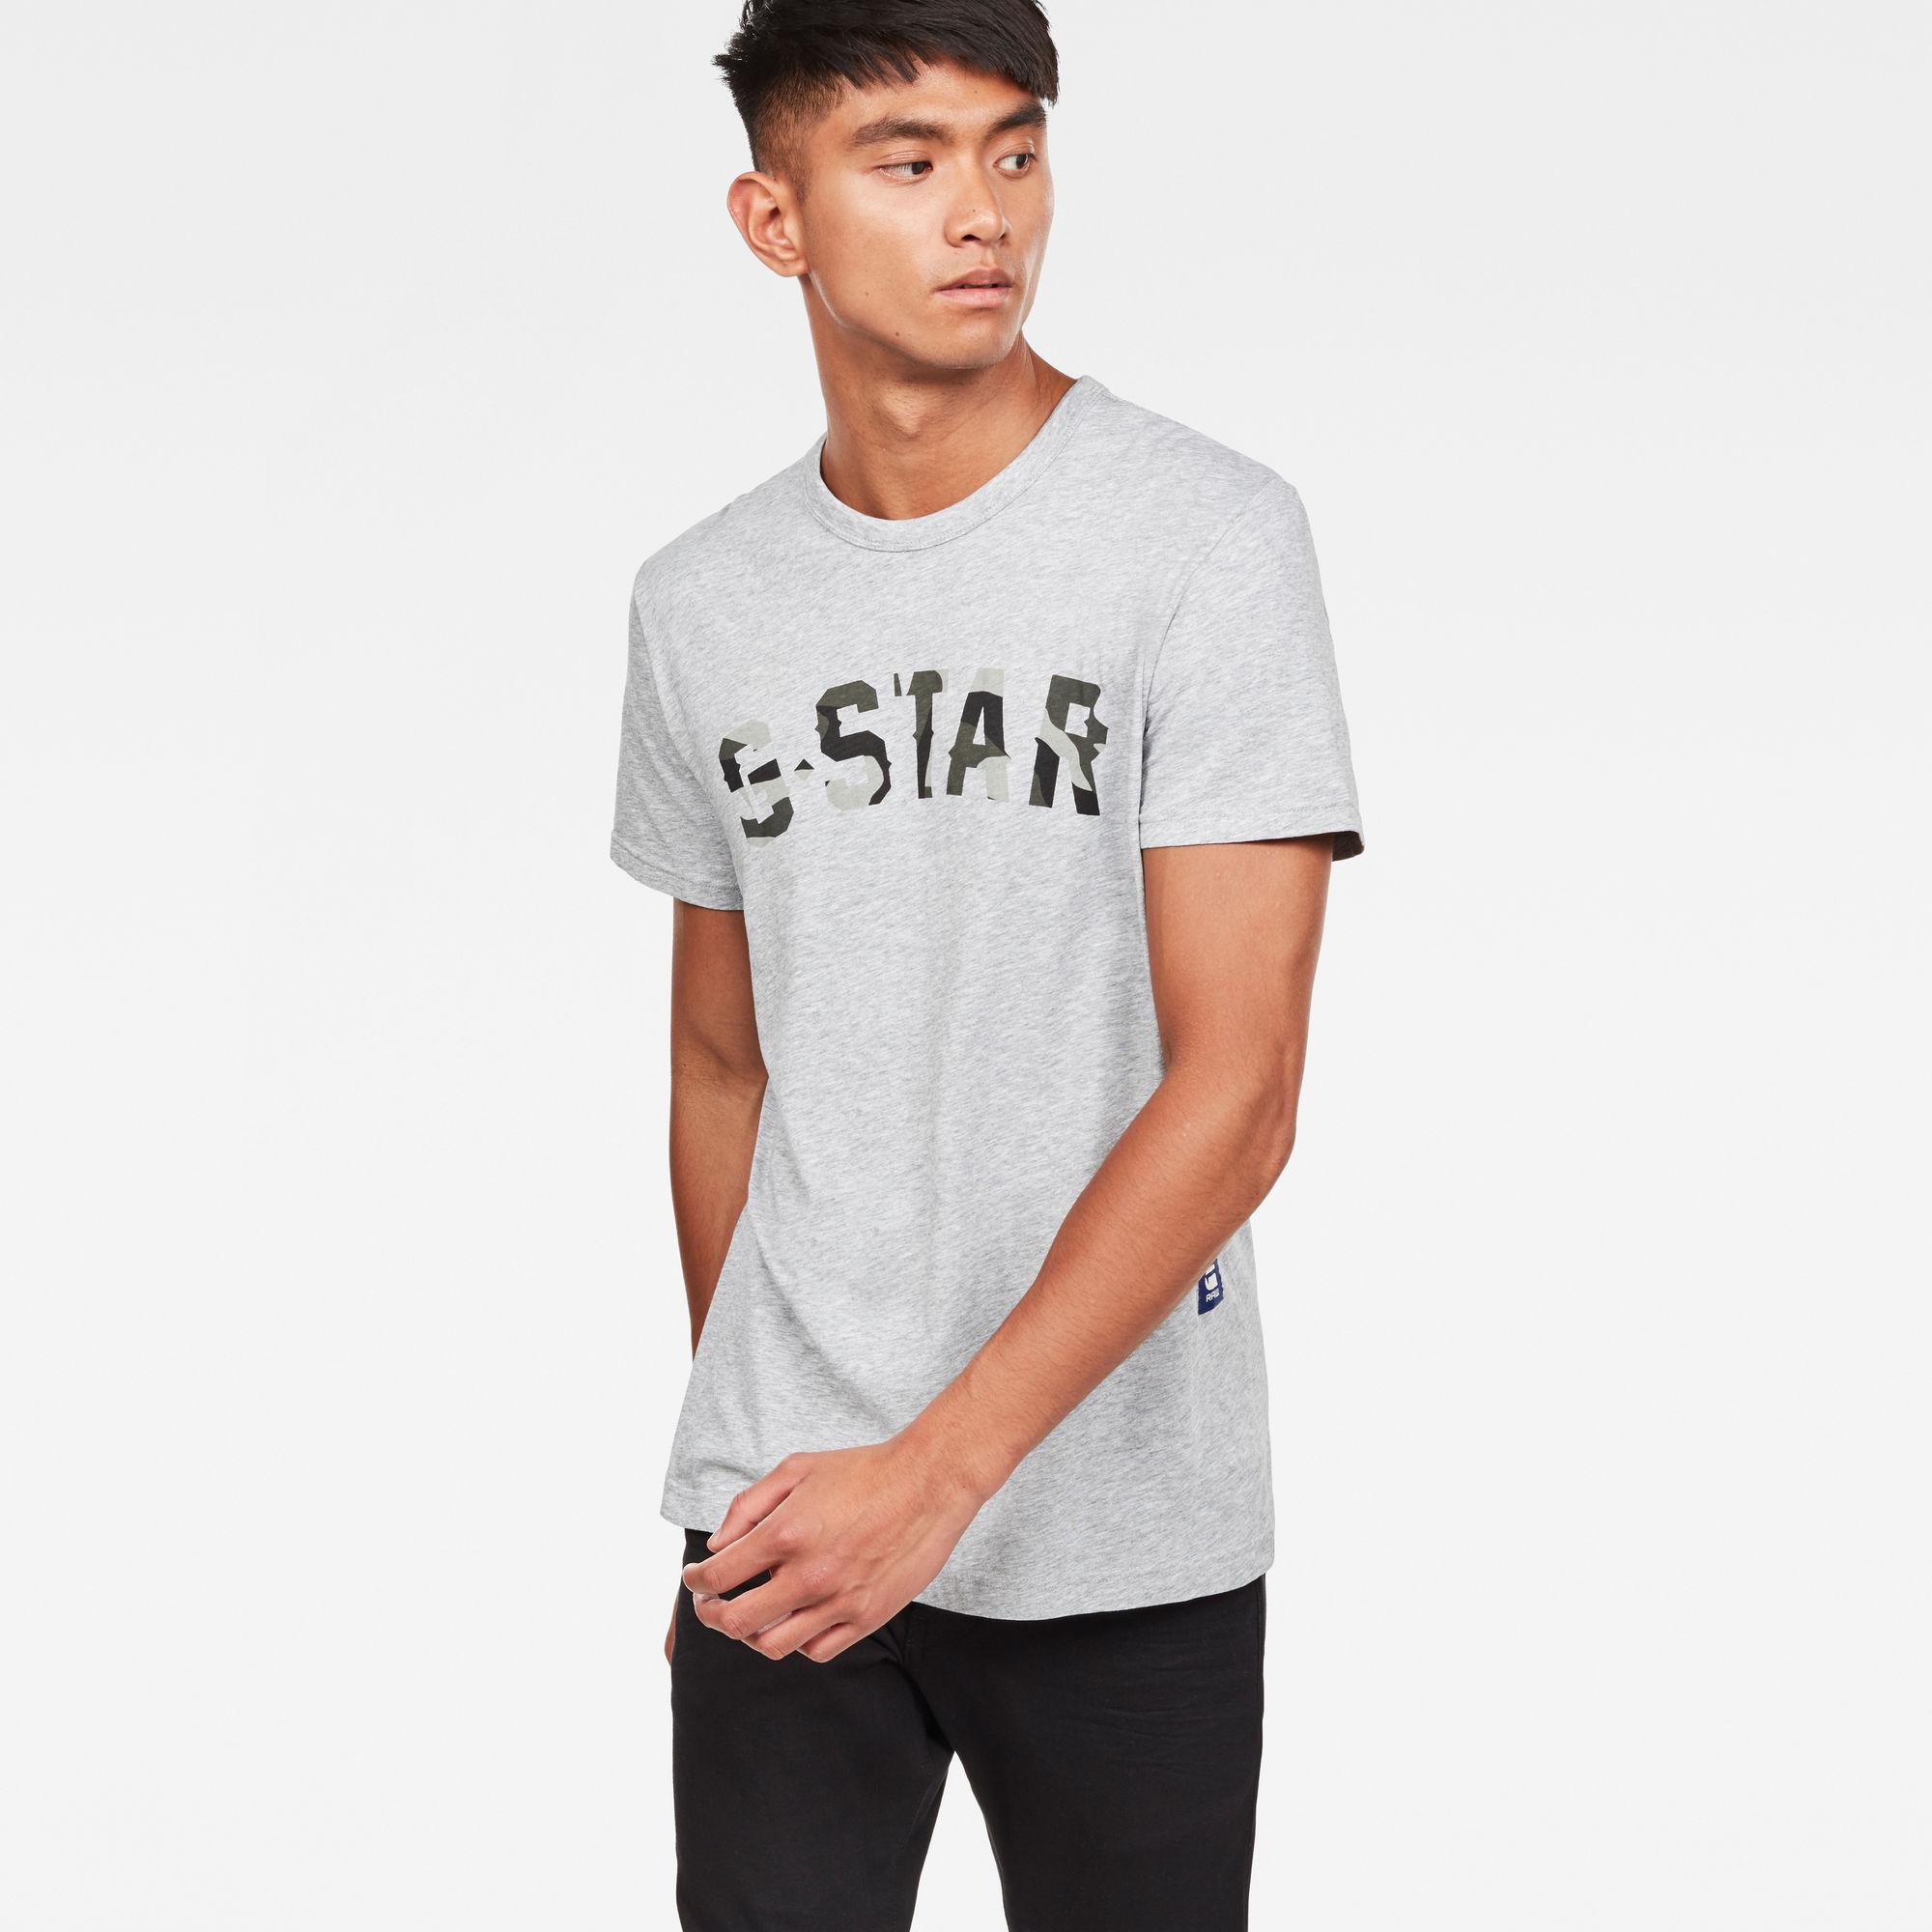 Image of G Star Raw Graphic 10 T-Shirt